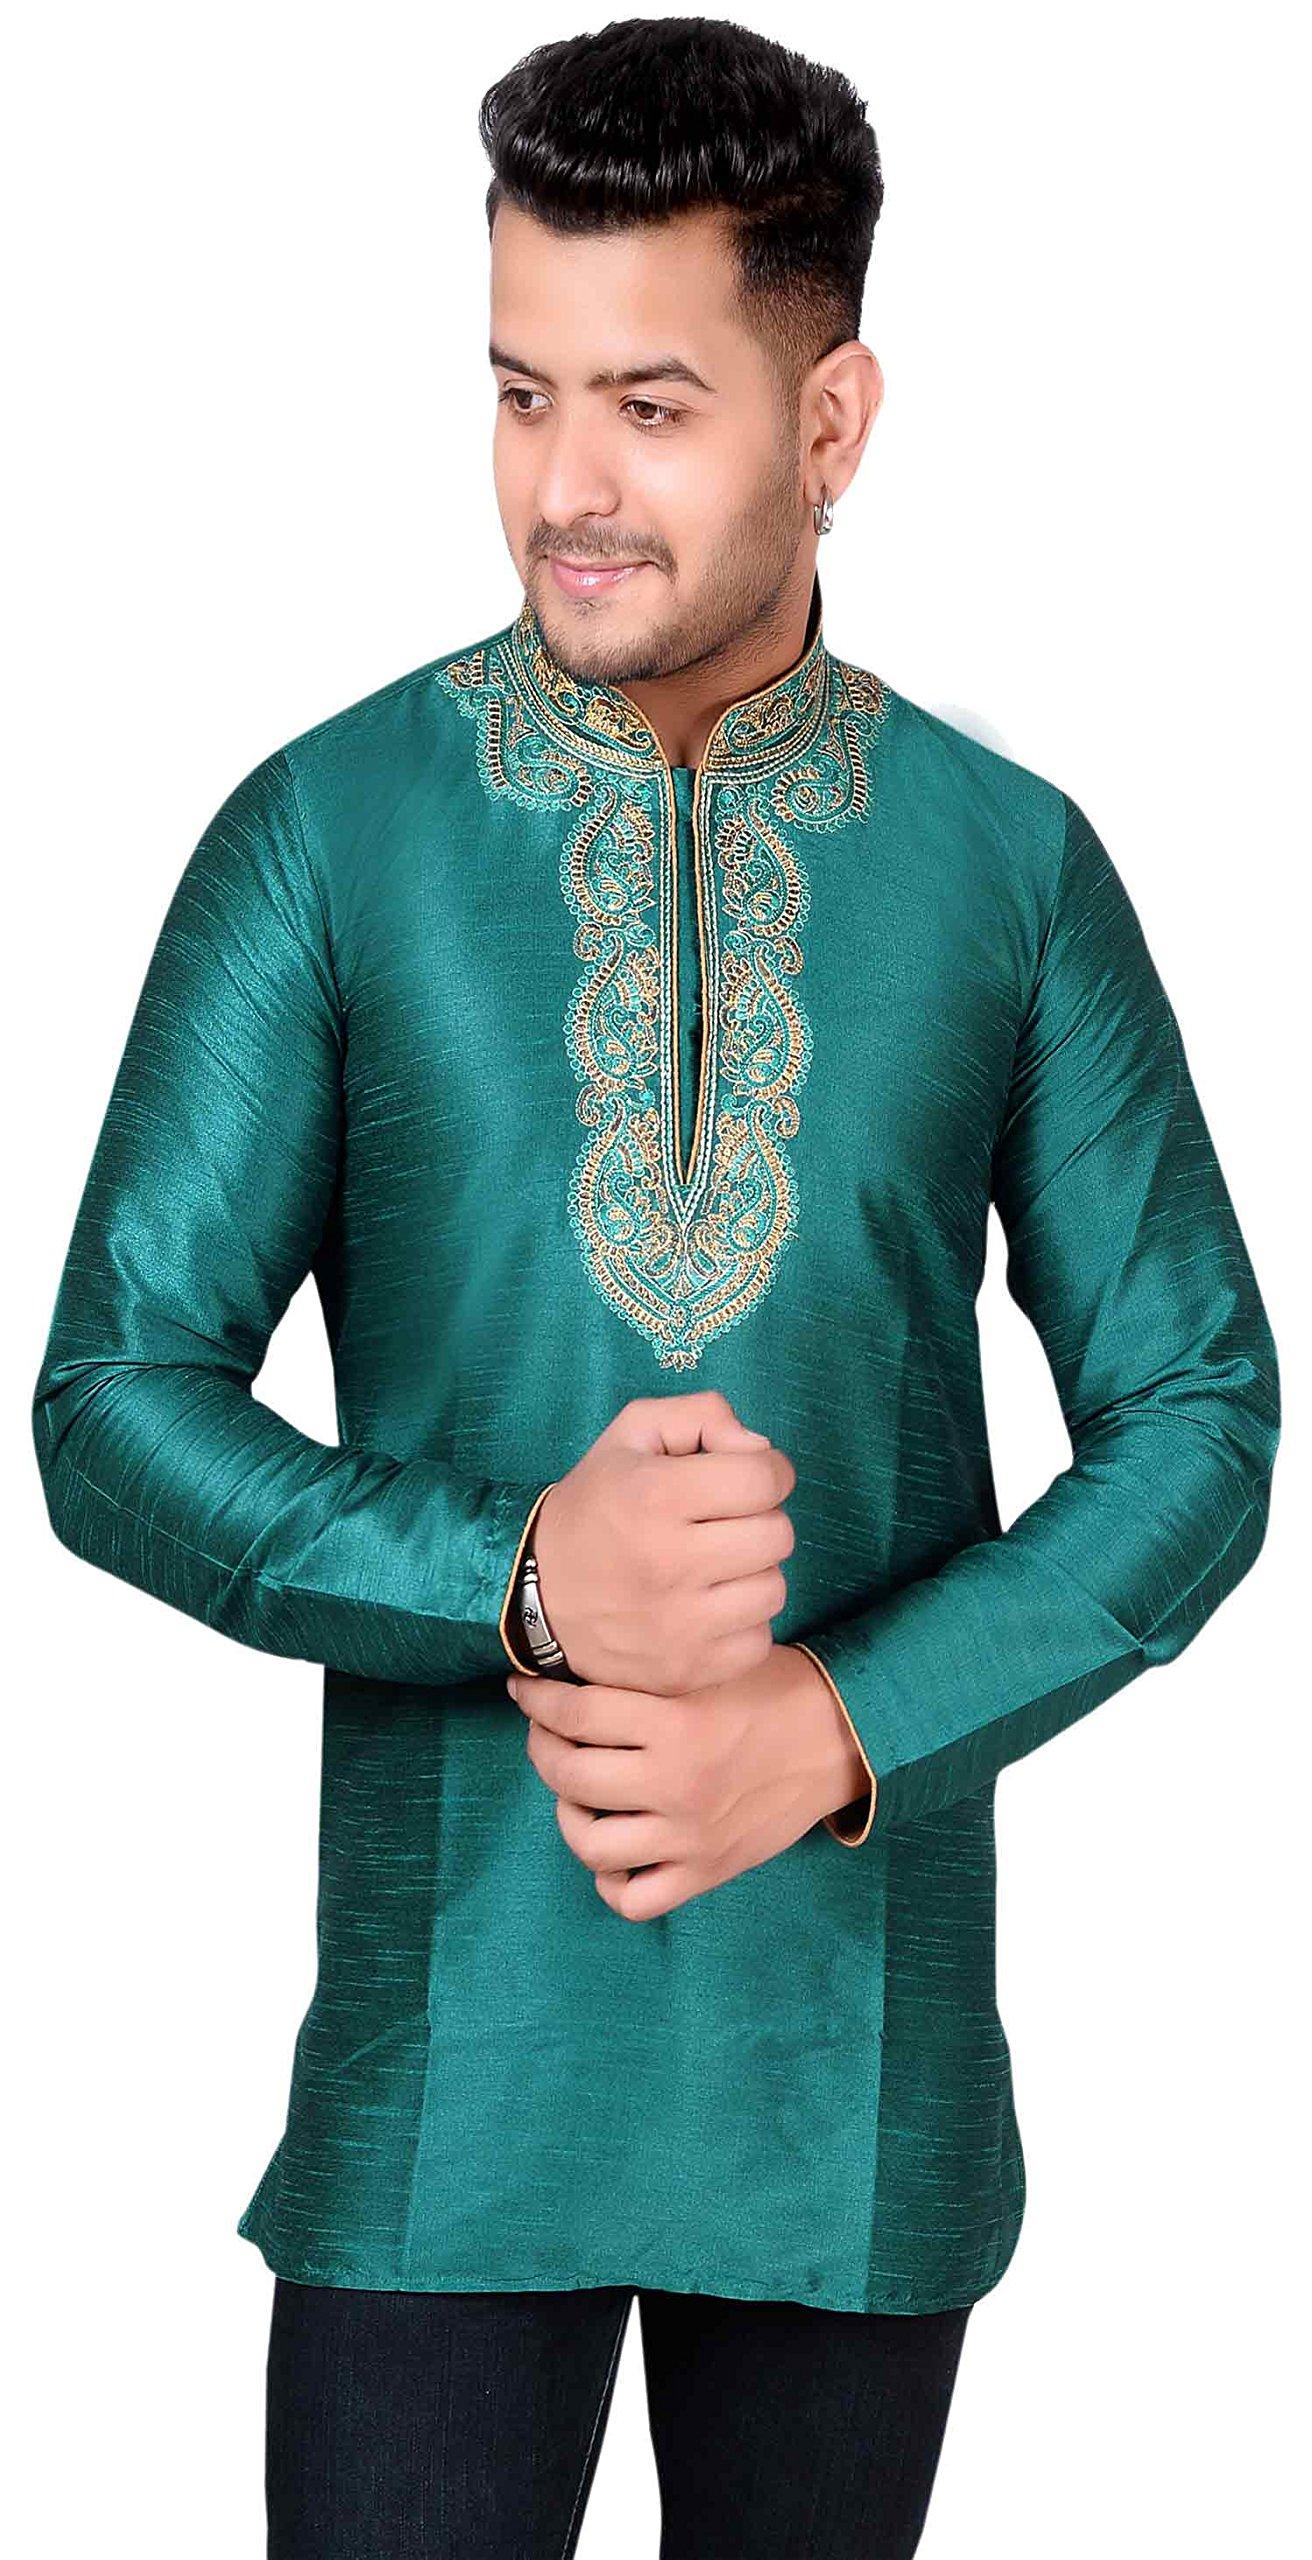 Men's Kurta Bollywood Party Wear Short Shirt 2006 (XXXL (Chest- 46 inches), Teal) by Desi Sarees (Image #1)